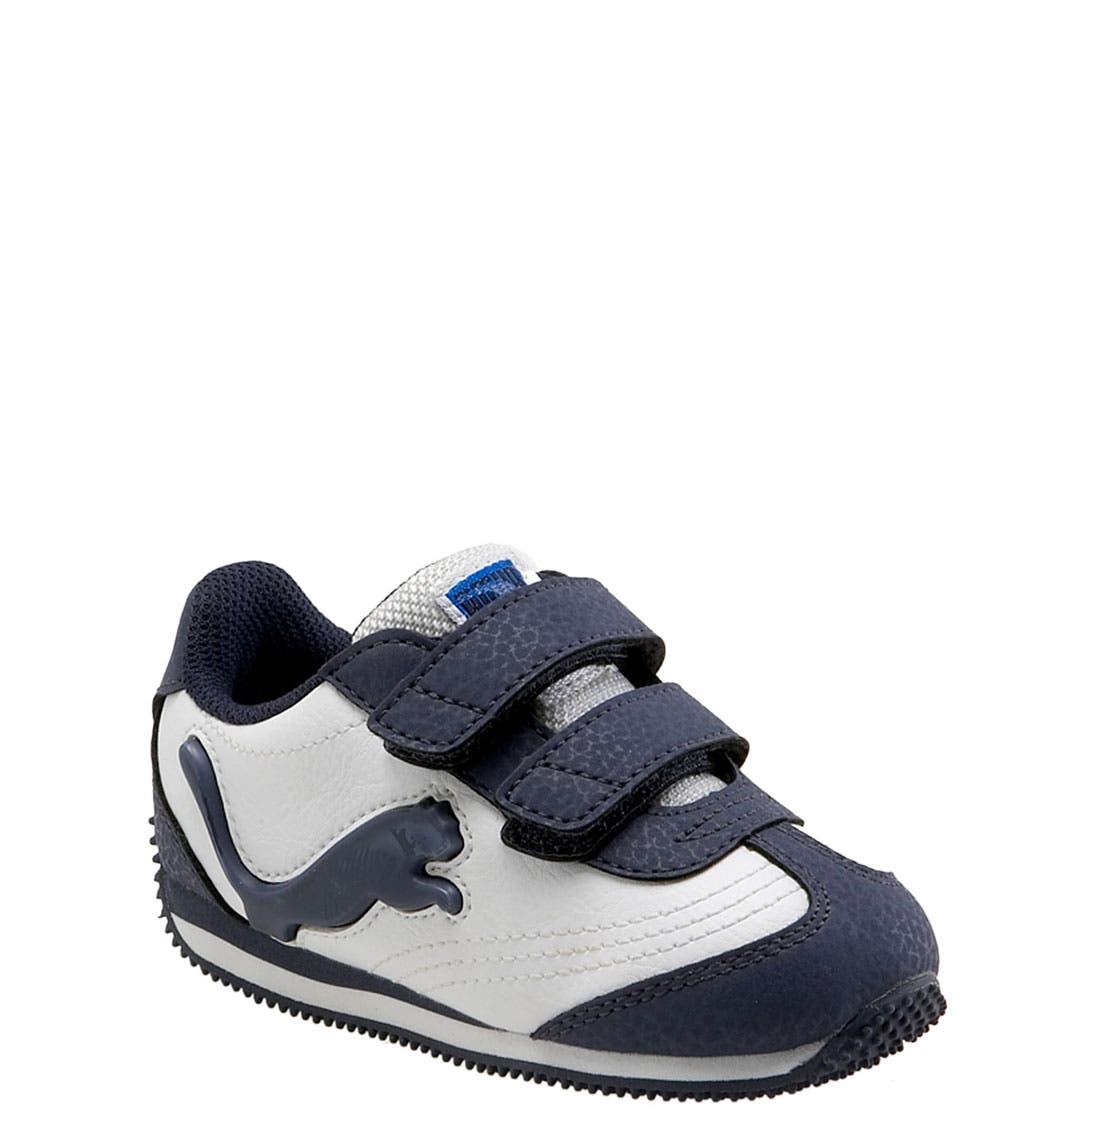 Main Image - PUMA 'Speeder Illuminescent' Sneaker (Baby, Walker & Toddler)